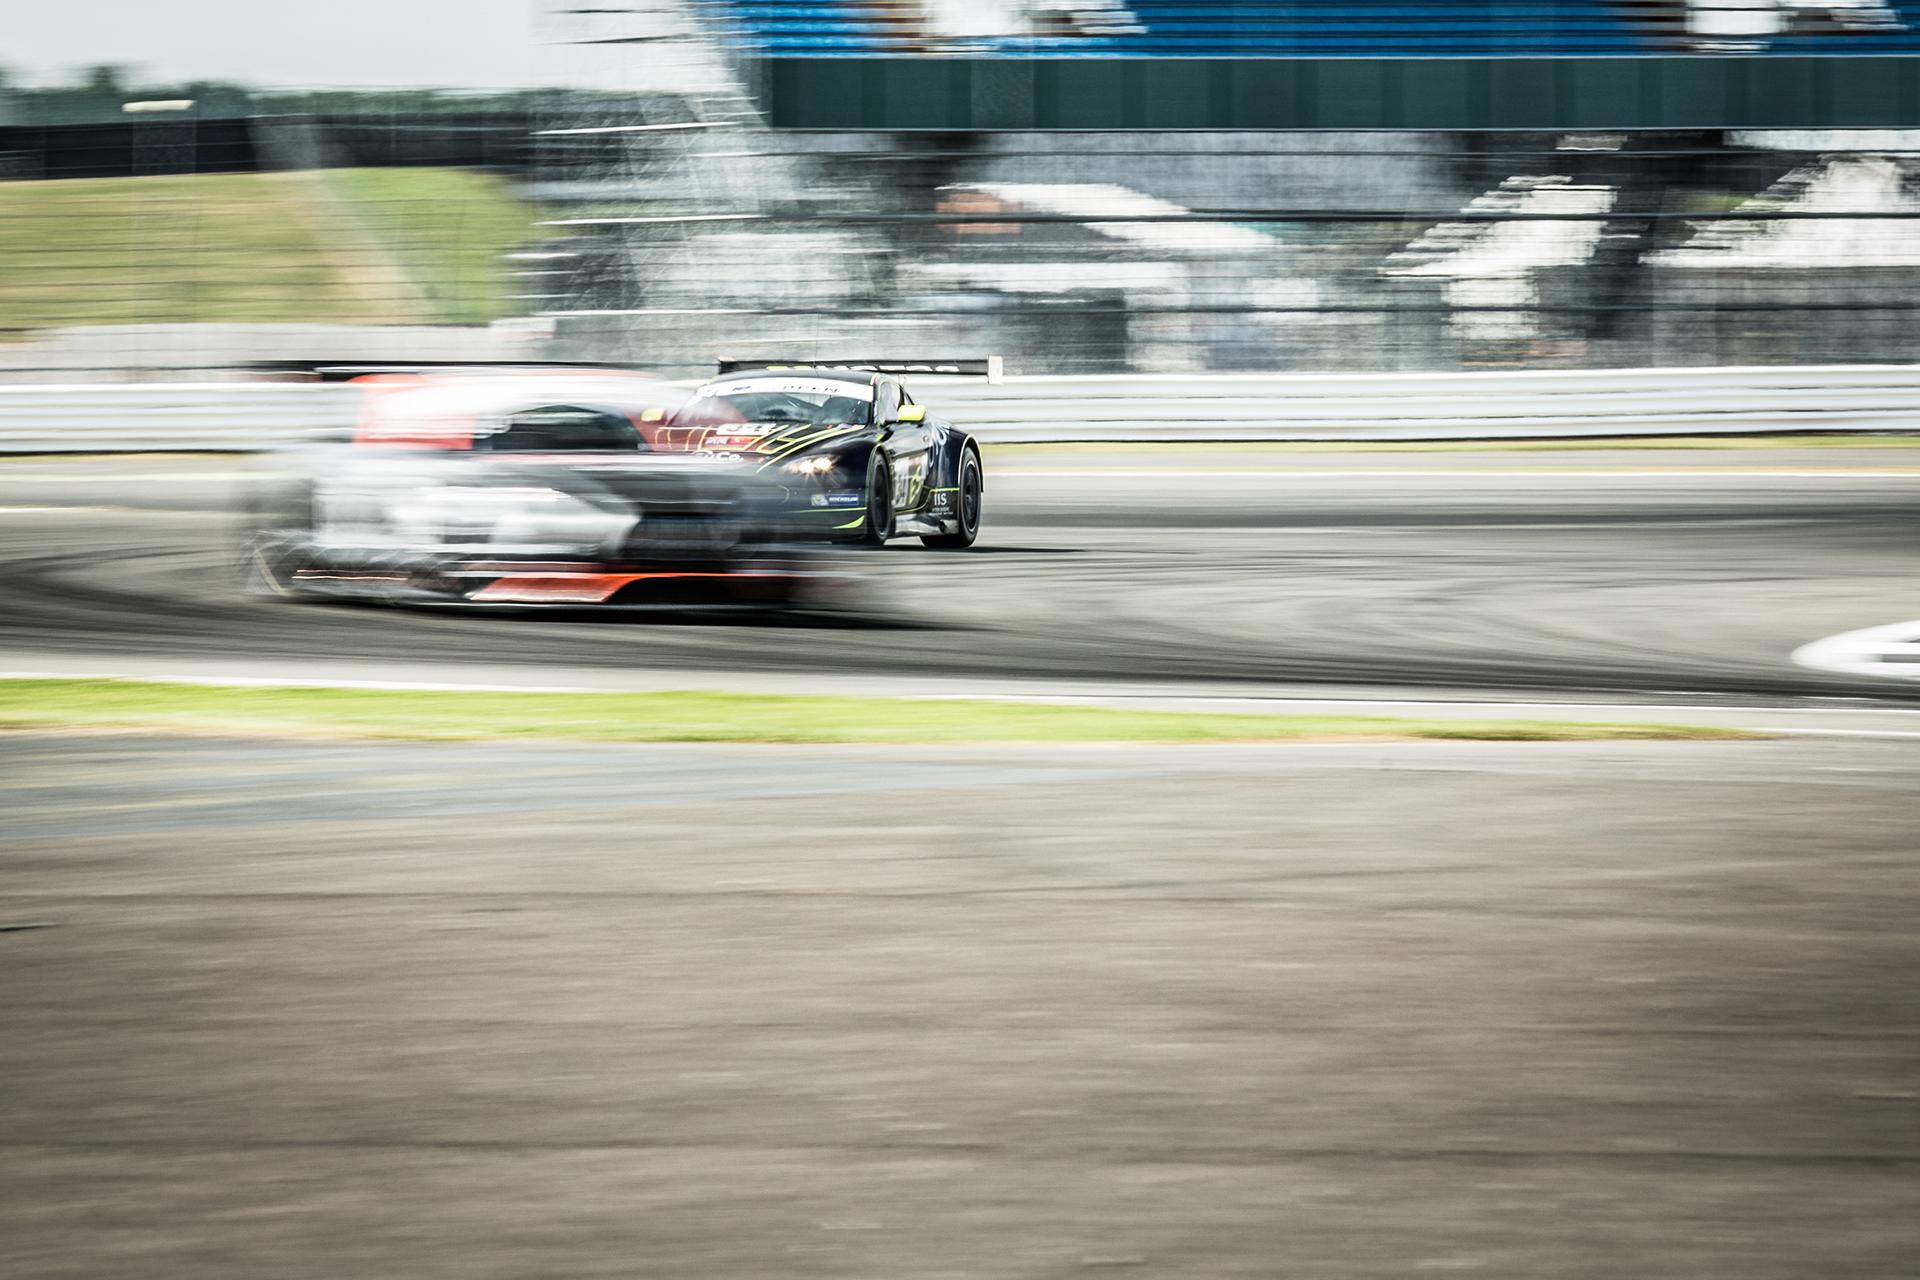 2016-IntGTOpen- Silverstone-50499.jpg